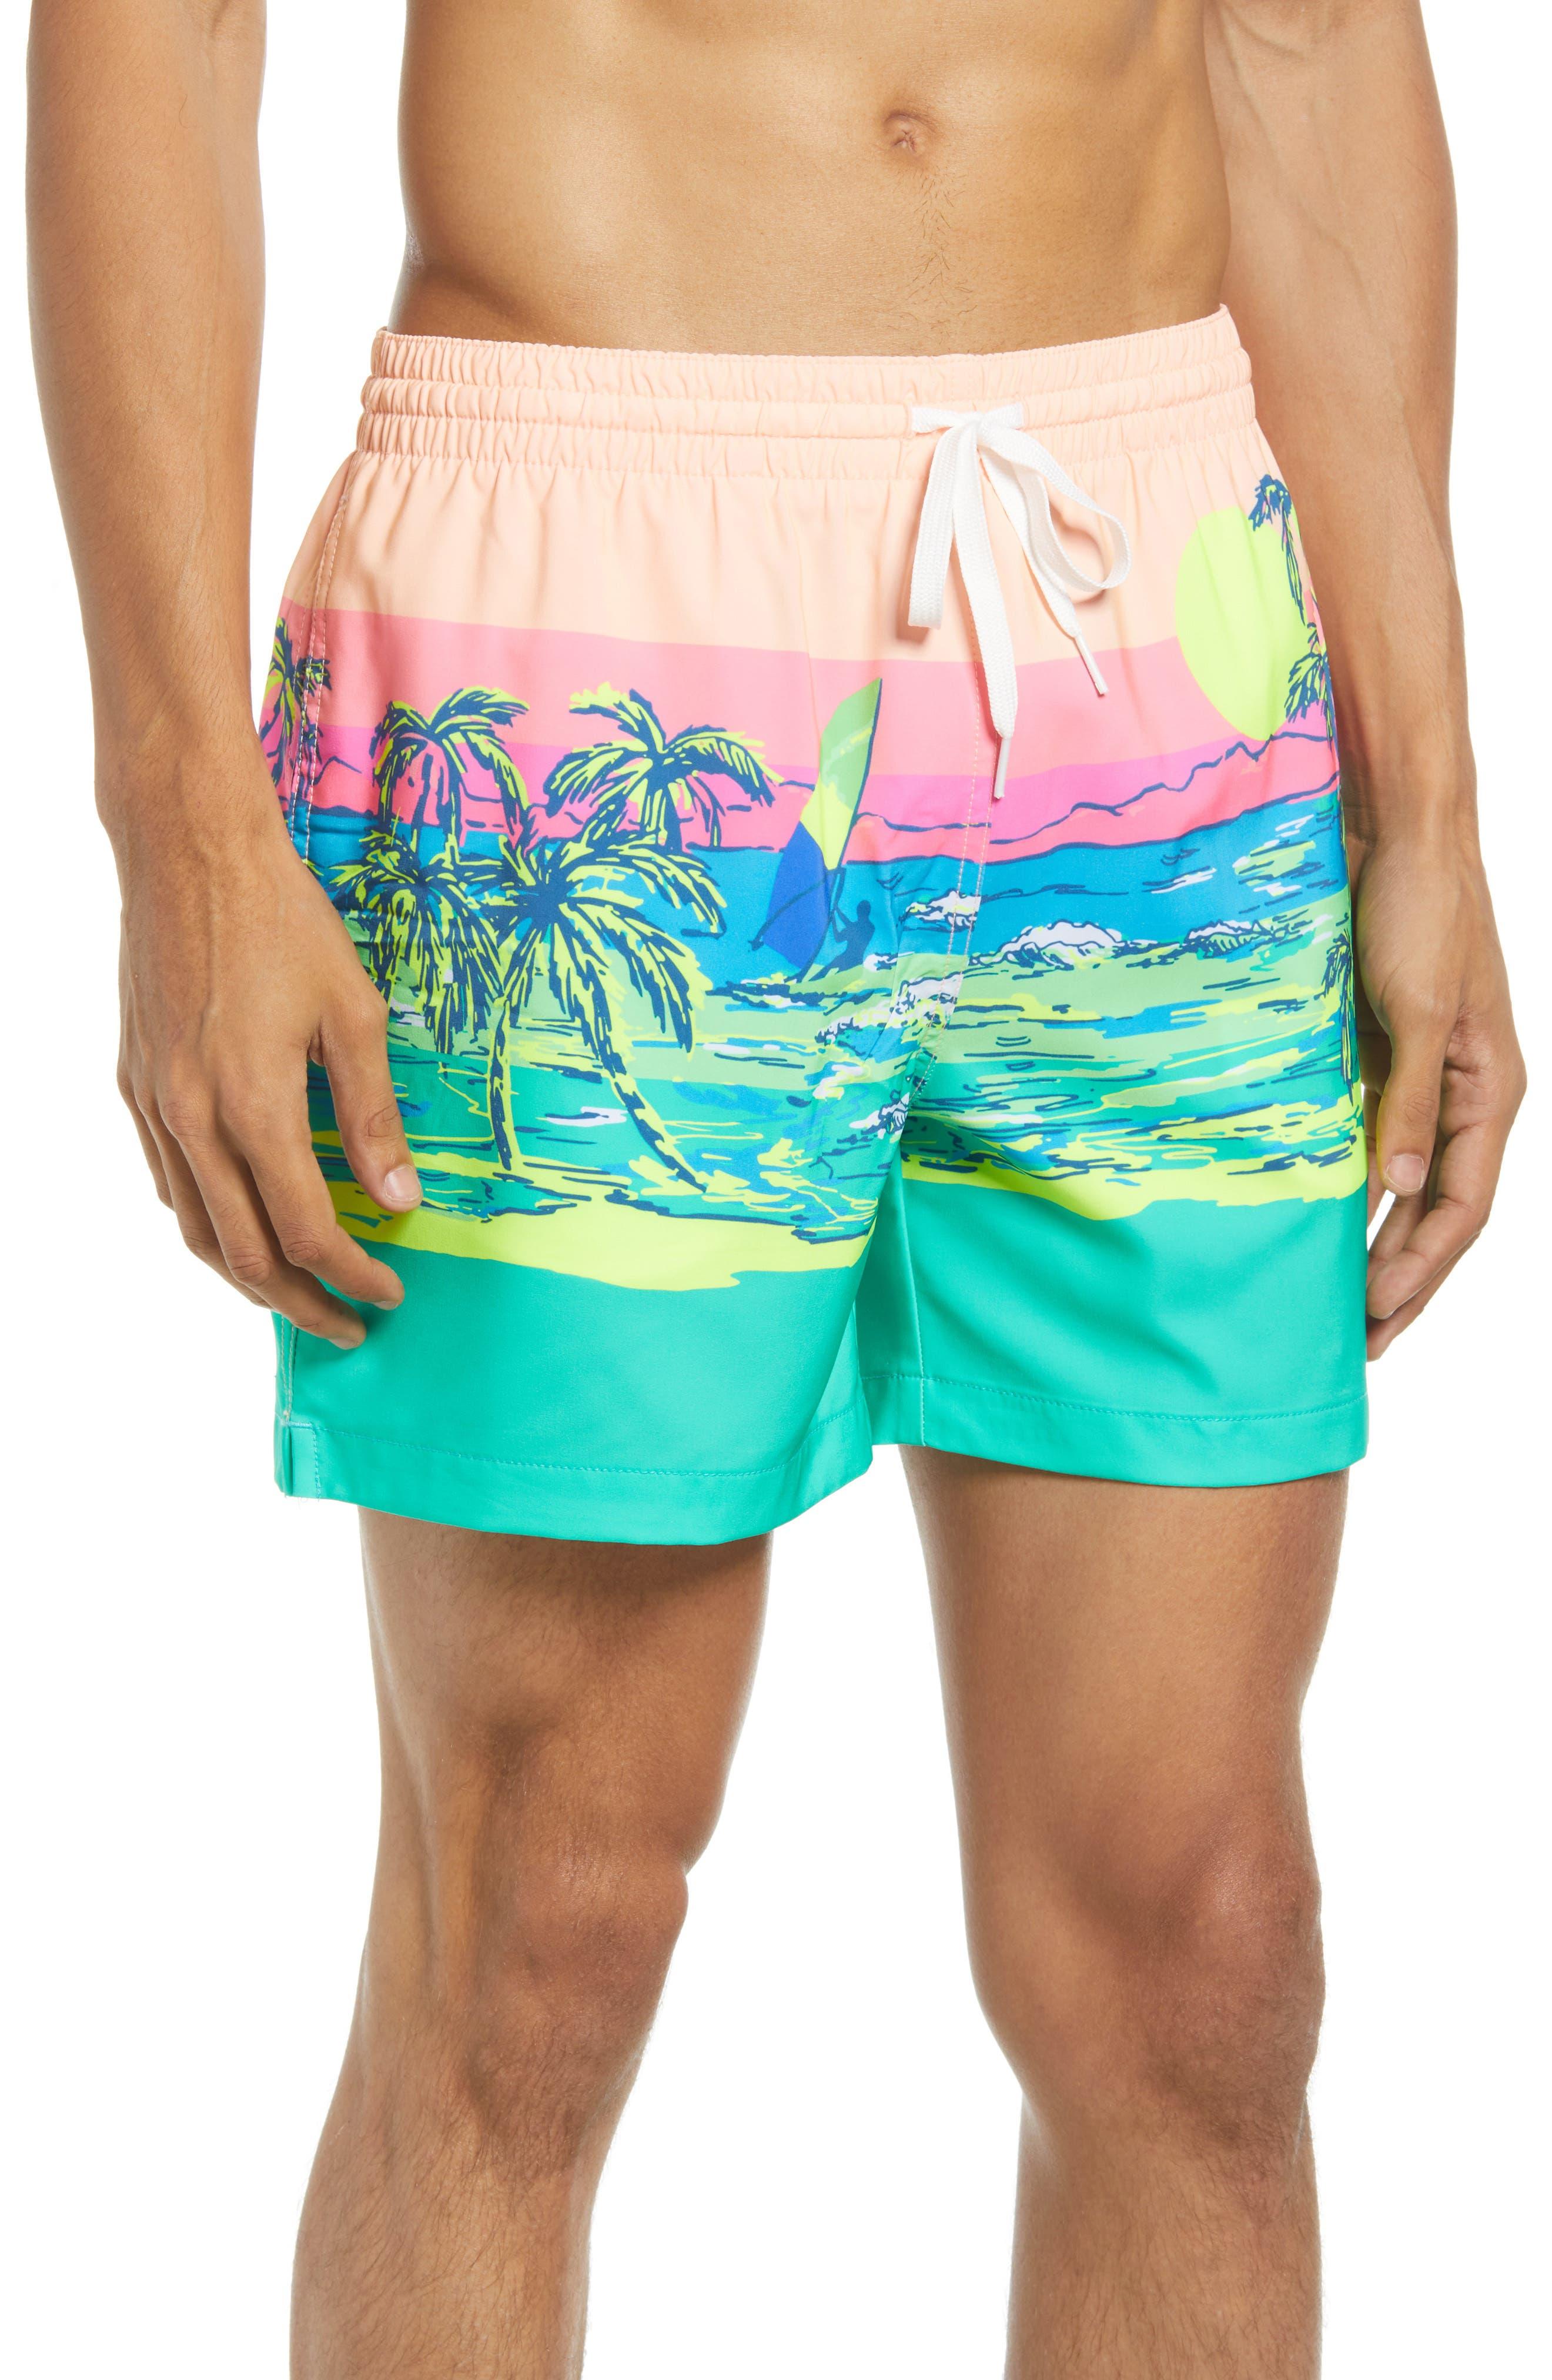 The Coastals 5.5-Inch Swim Trunks